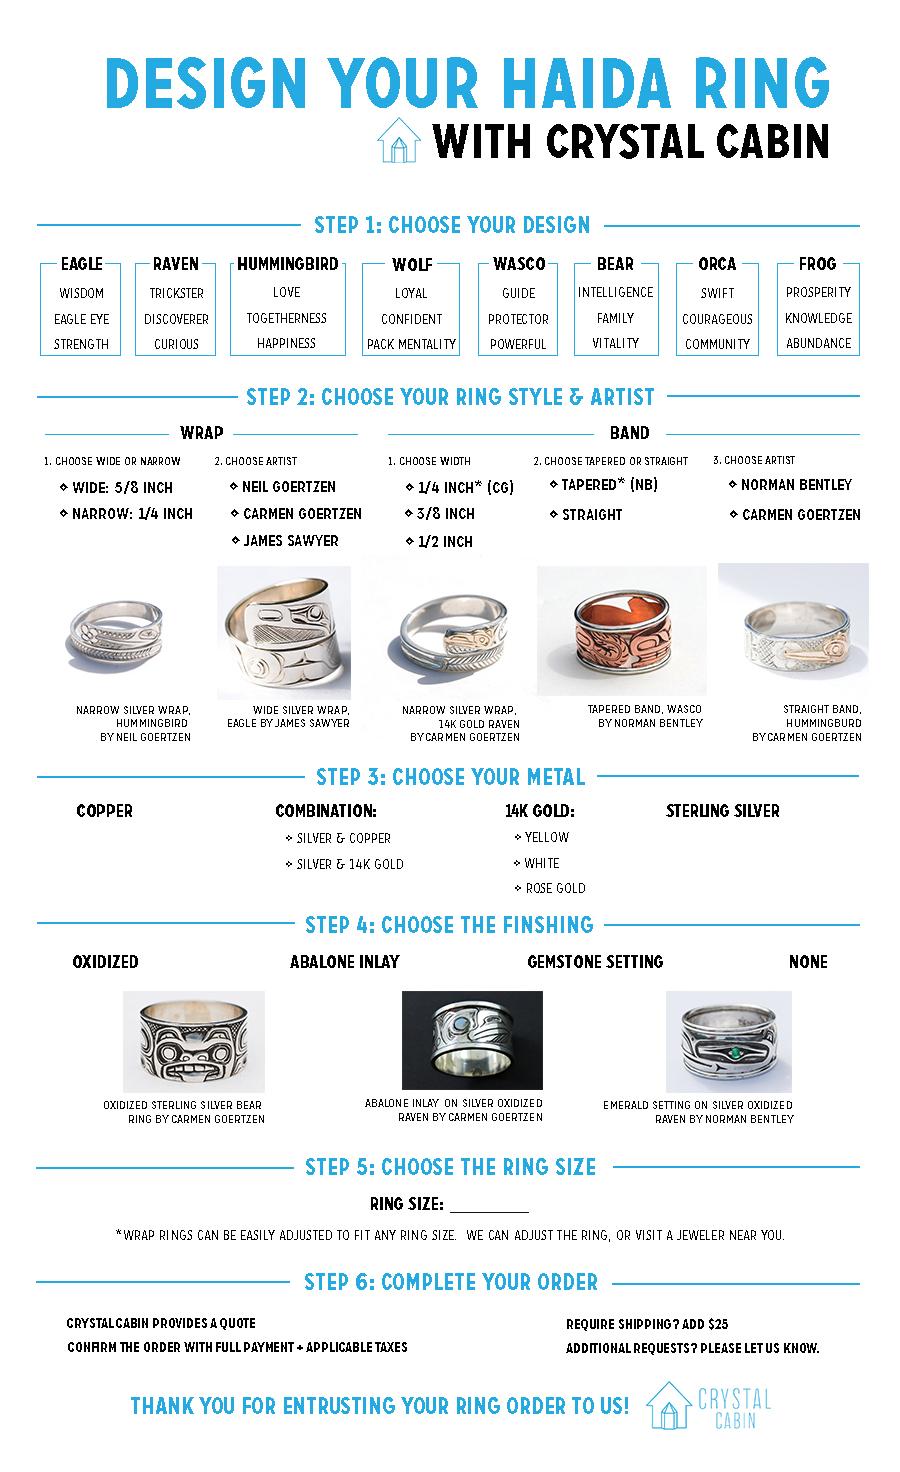 Design your haida ring